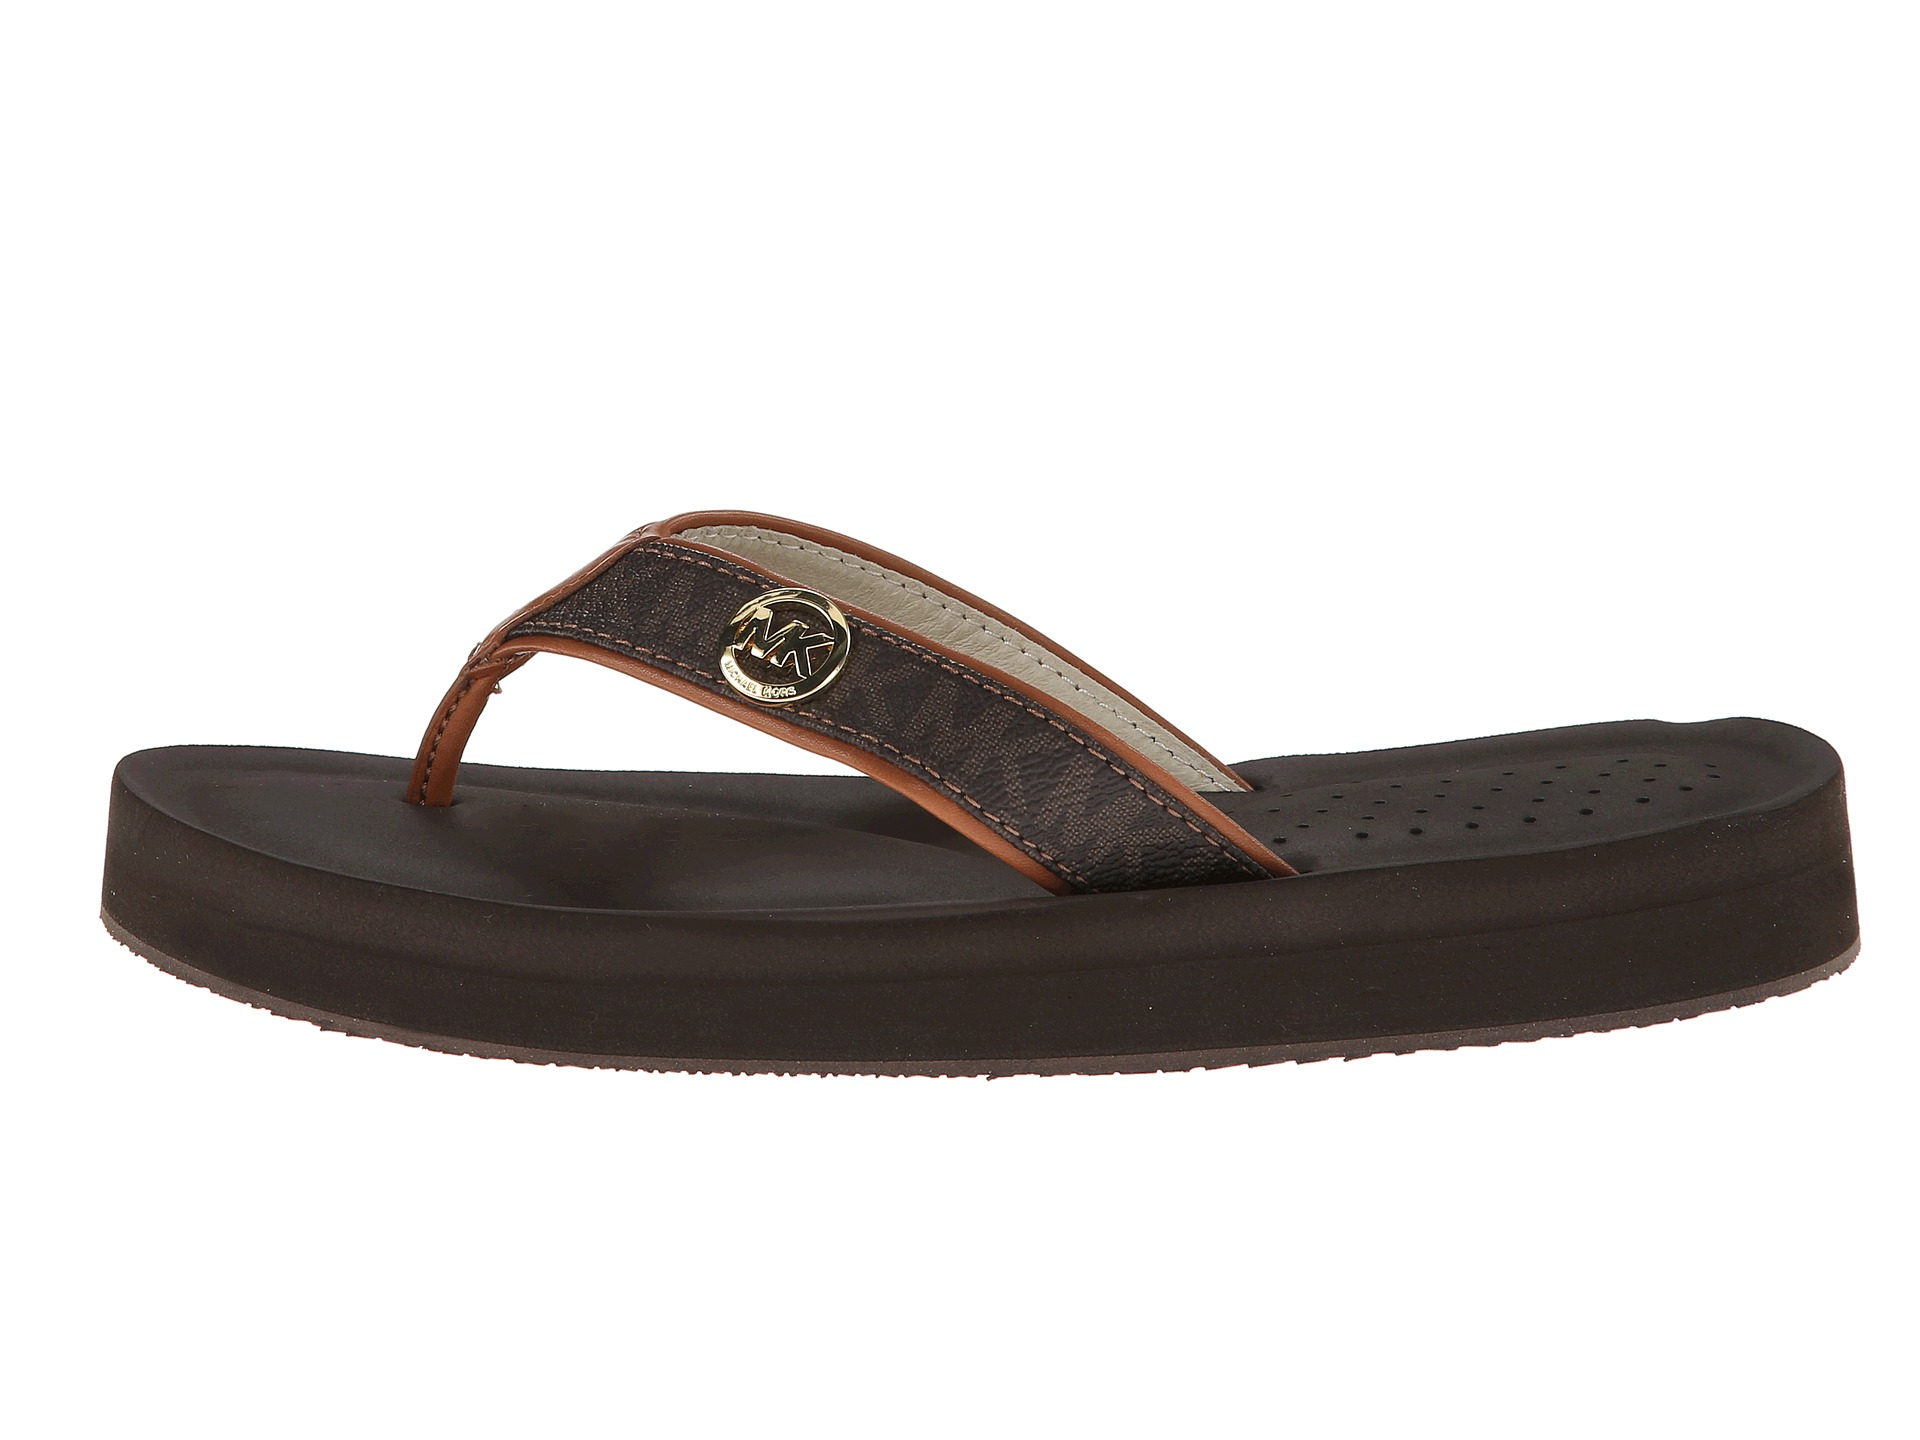 d98a0efef Buy michael kors flip flop sandals   OFF74% Discounted